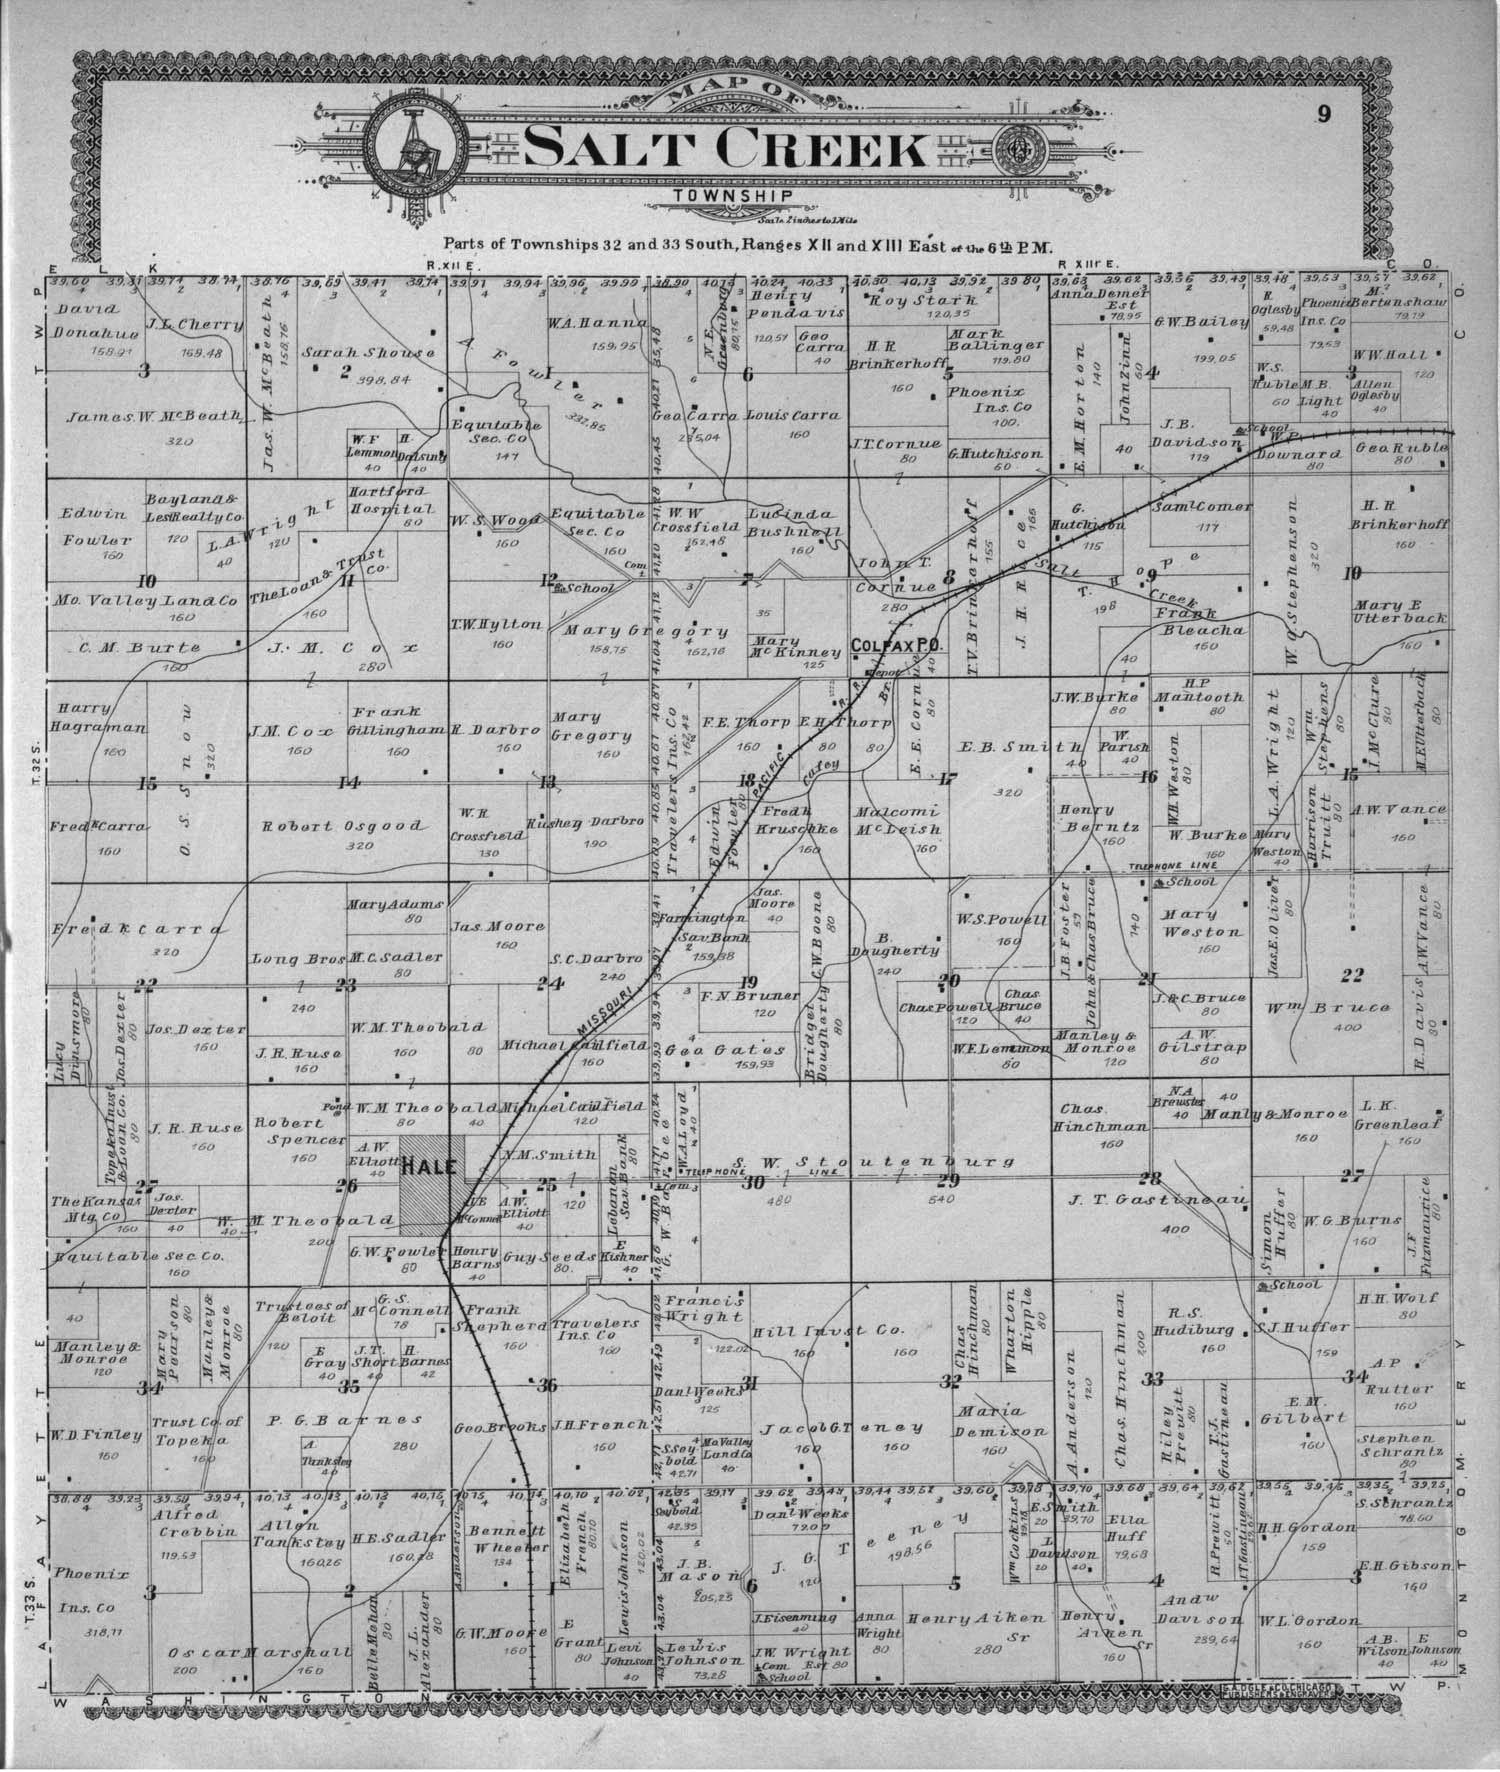 Standard atlas of Chautauqua County, Kansas - 9